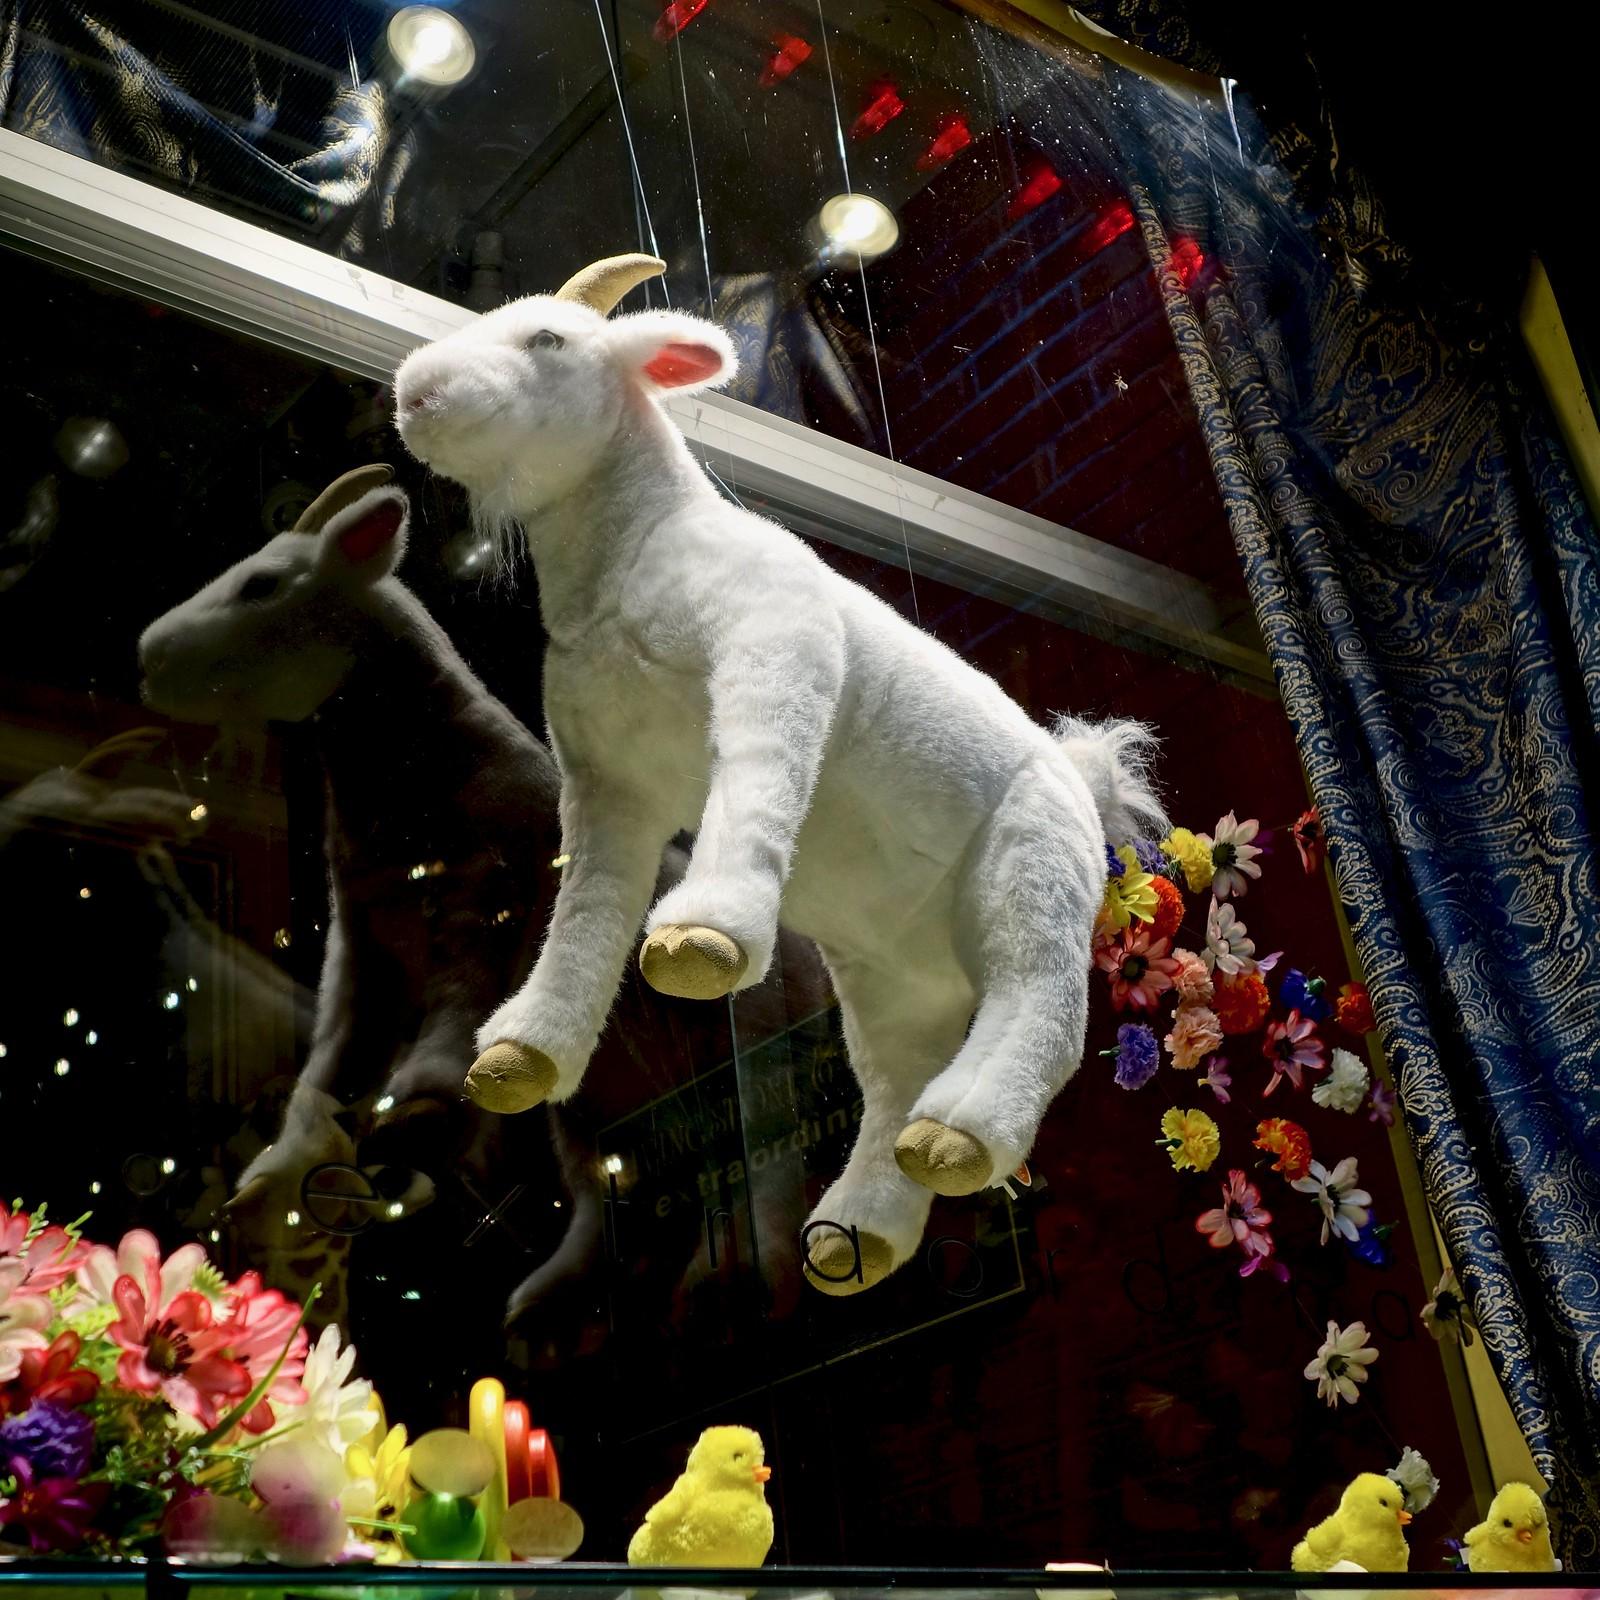 Flying goat, Calgary, Alberta, Canada